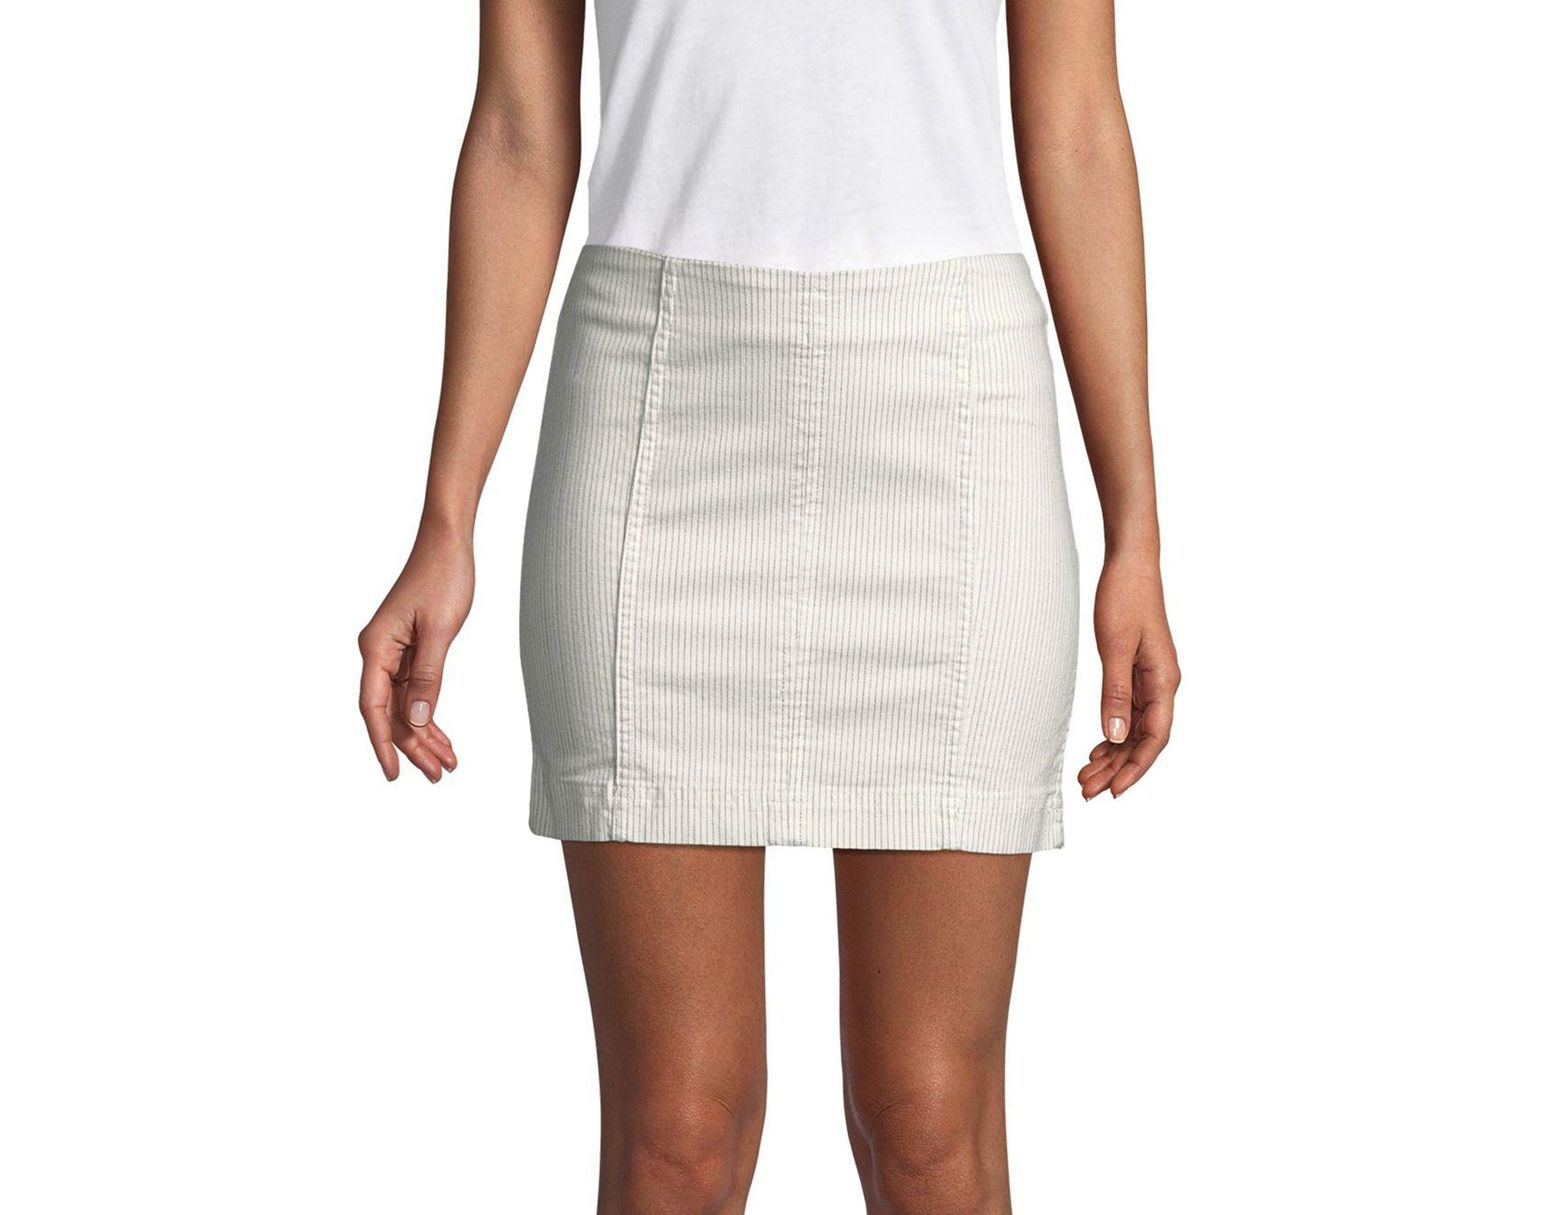 6255a0126 Free People Modern Femme Novelty Stripe Mini Skirt in White - Lyst